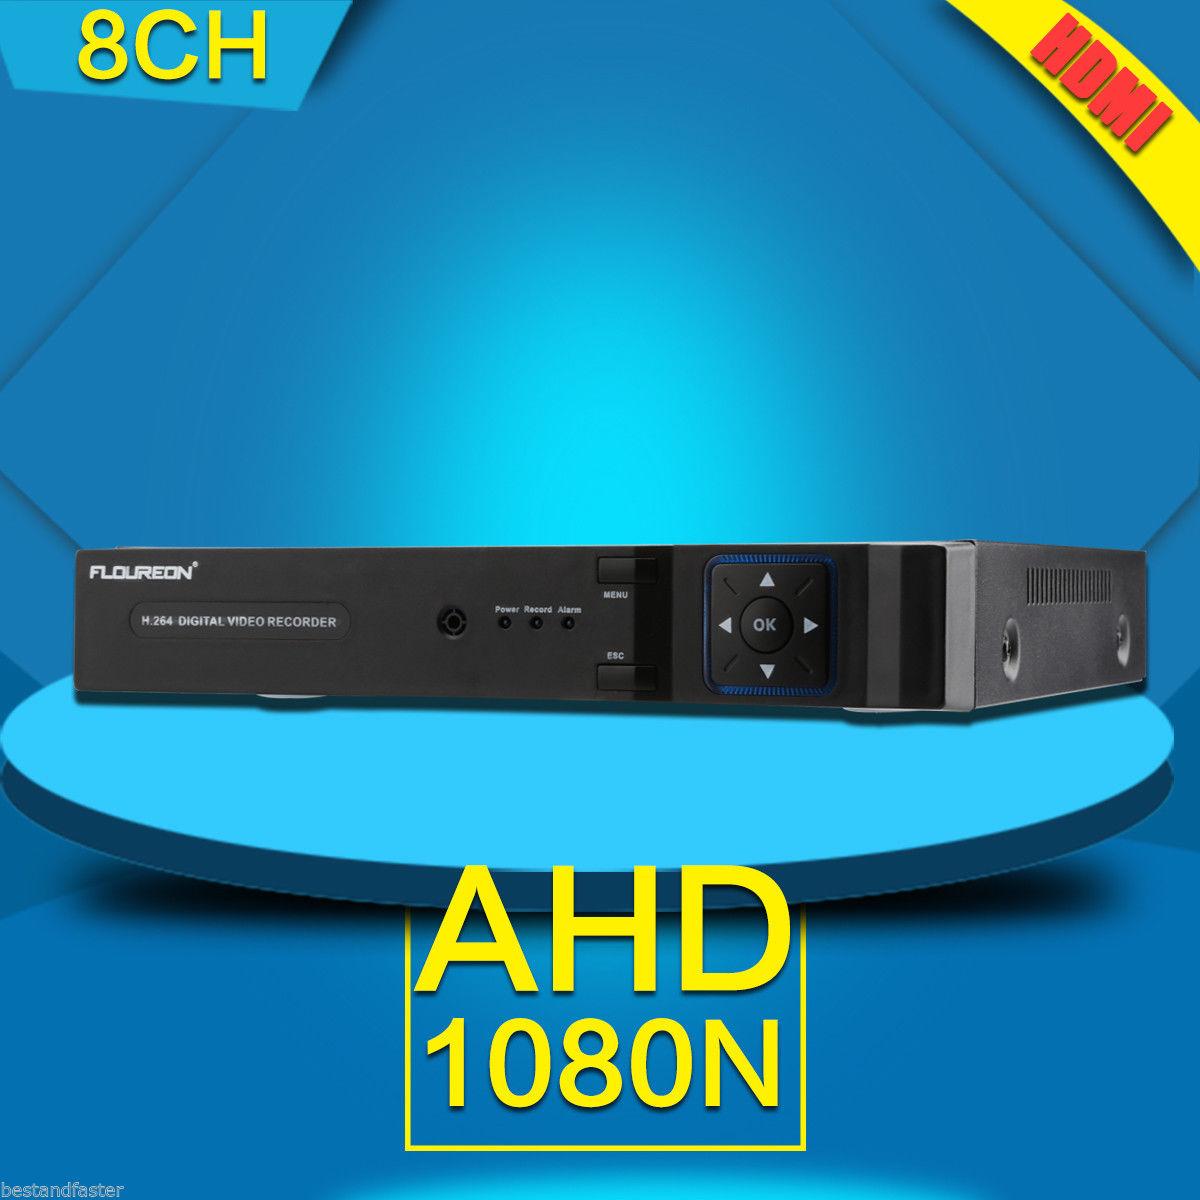 FLOUREON CCTV 8CH 5 IN 1 1080N HDMI P2P DVR surveillance Digital camera  Video Recorder Cloud